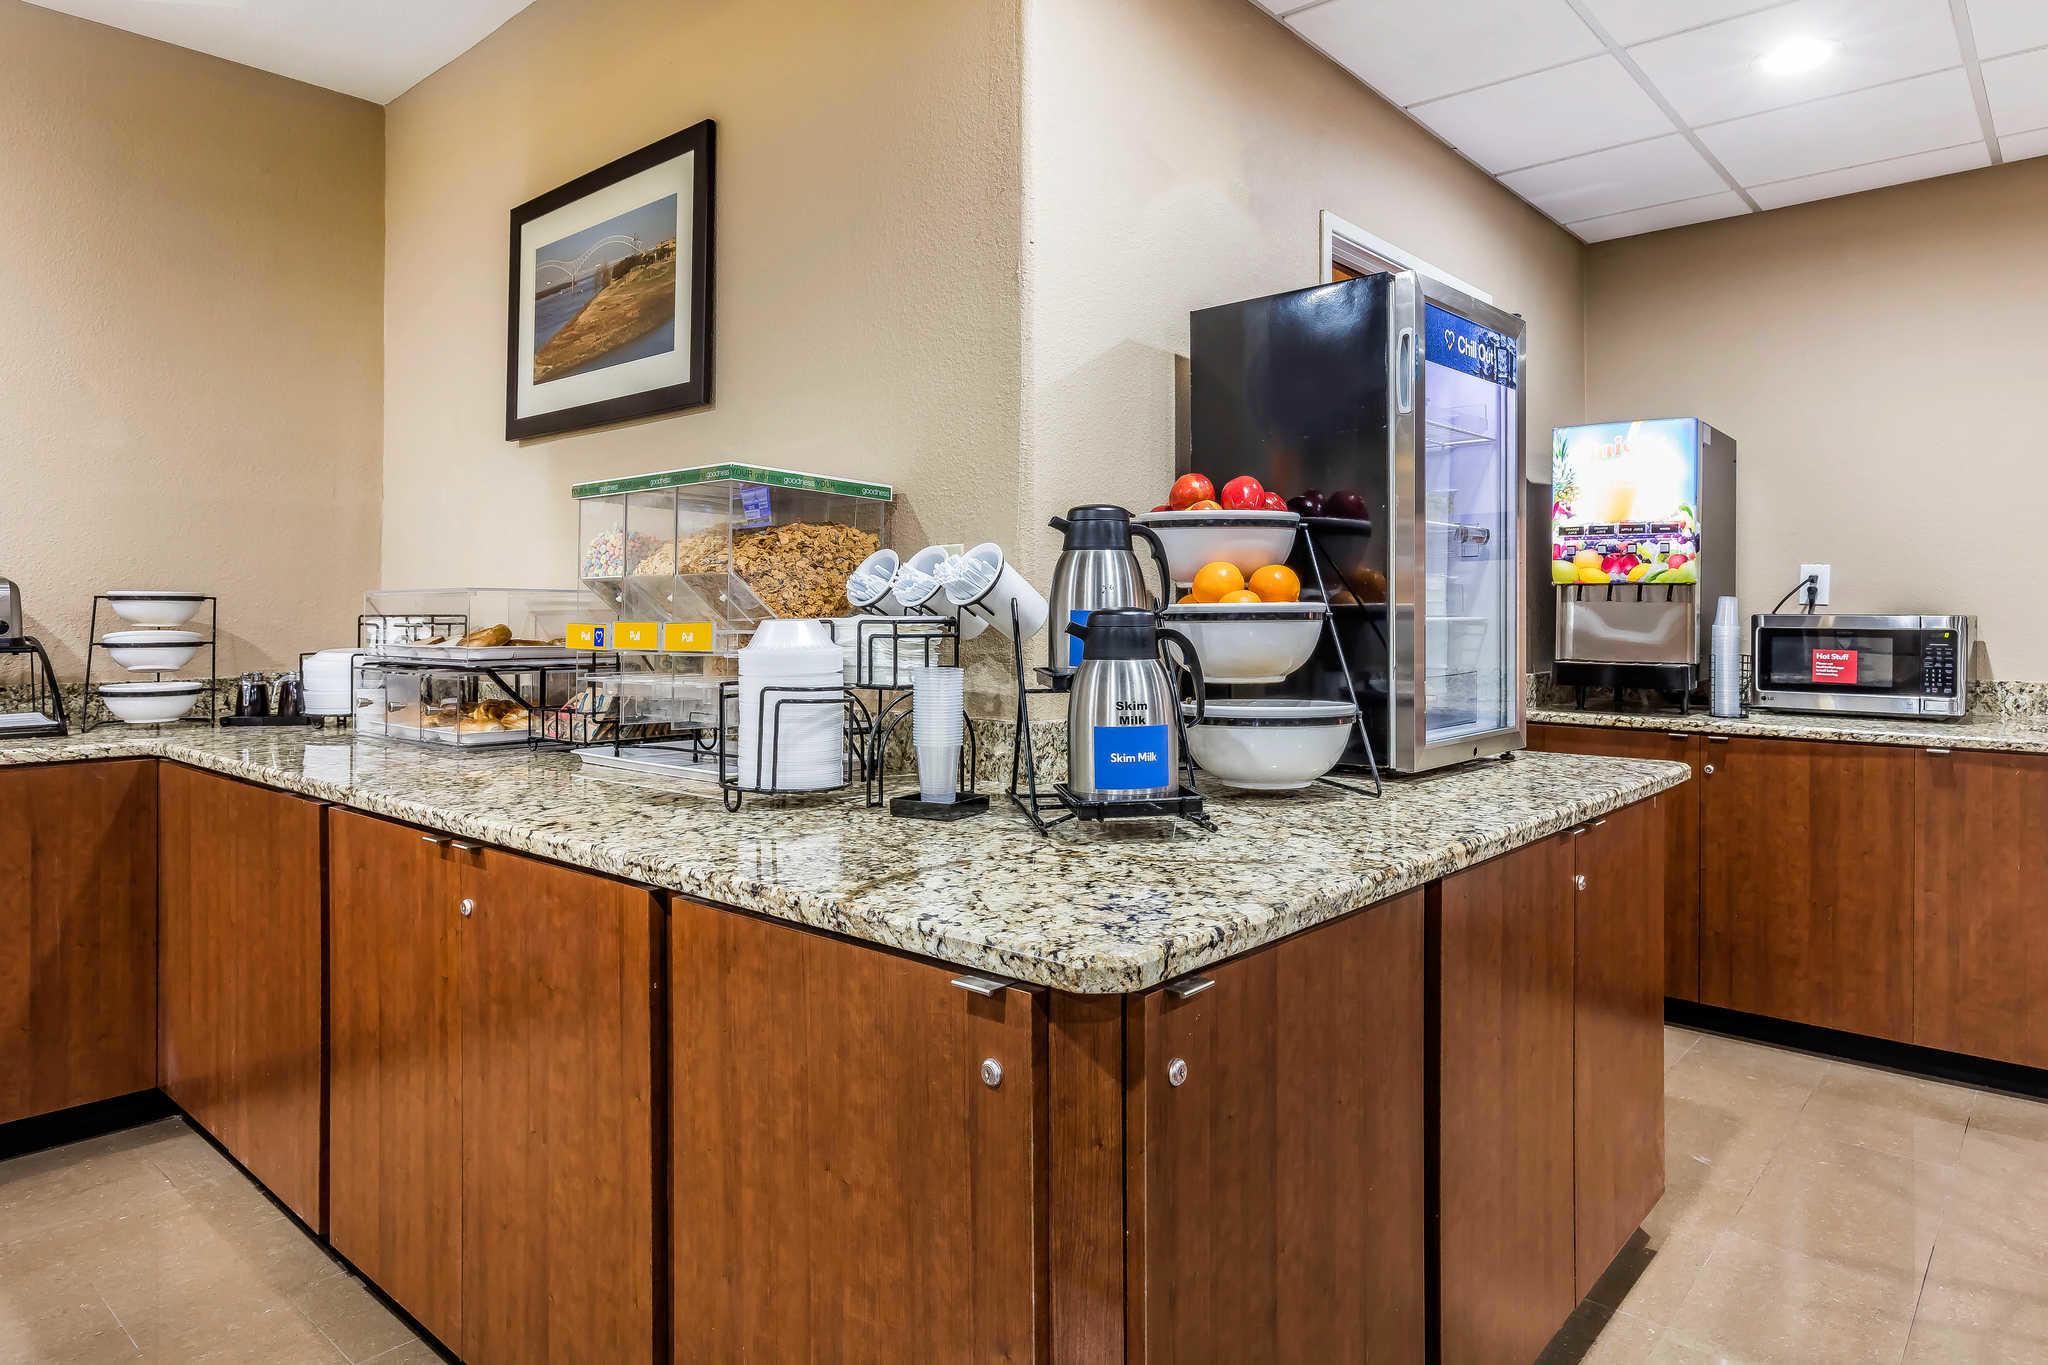 Comfort Inn & Suites Airport-American Way image 22